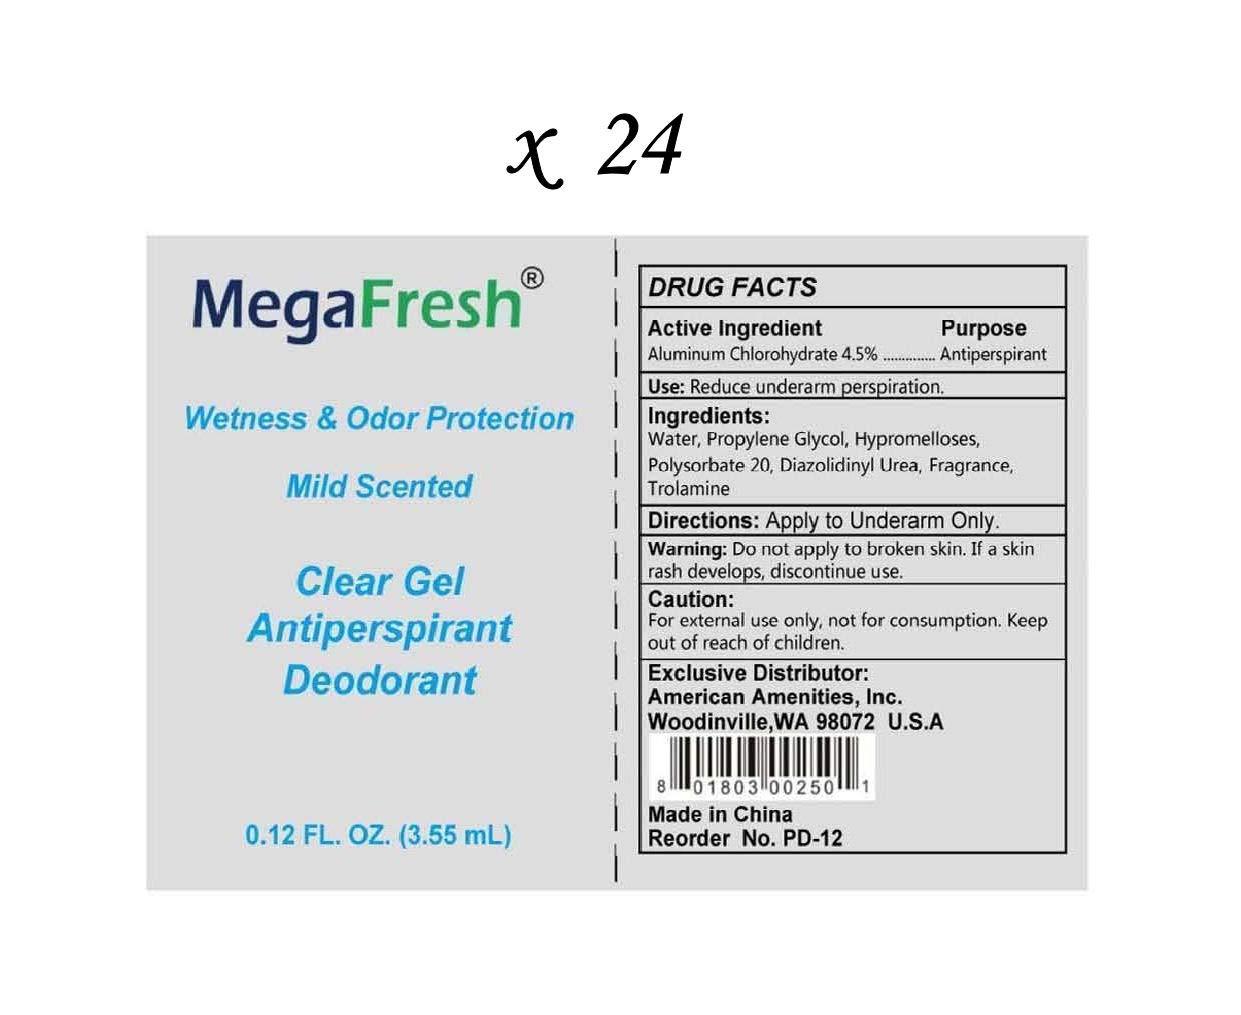 LOT: 24 MegaFresh Travel Size Clear Gel Antiperspirant Deodorant Liquid Packets - 0.12 Oz